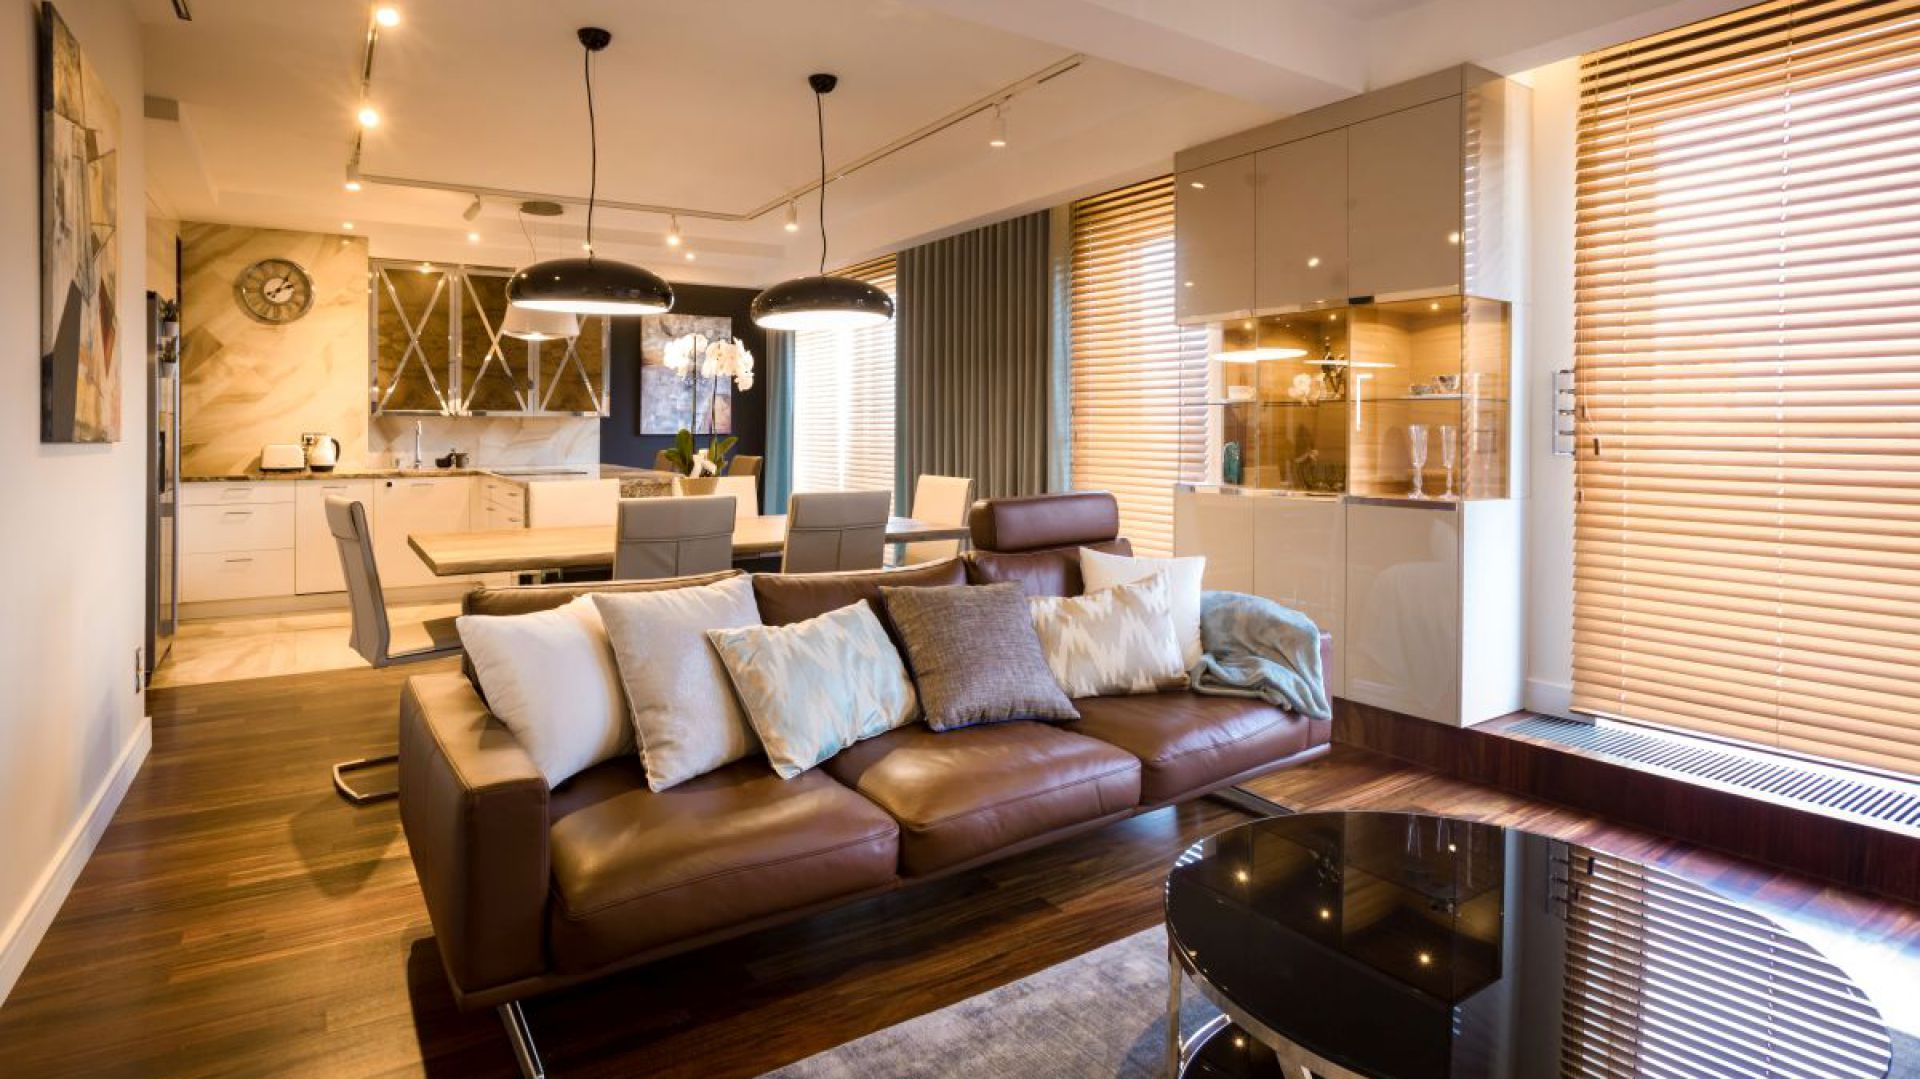 Bursztynowy apartament Fot. Viva Design